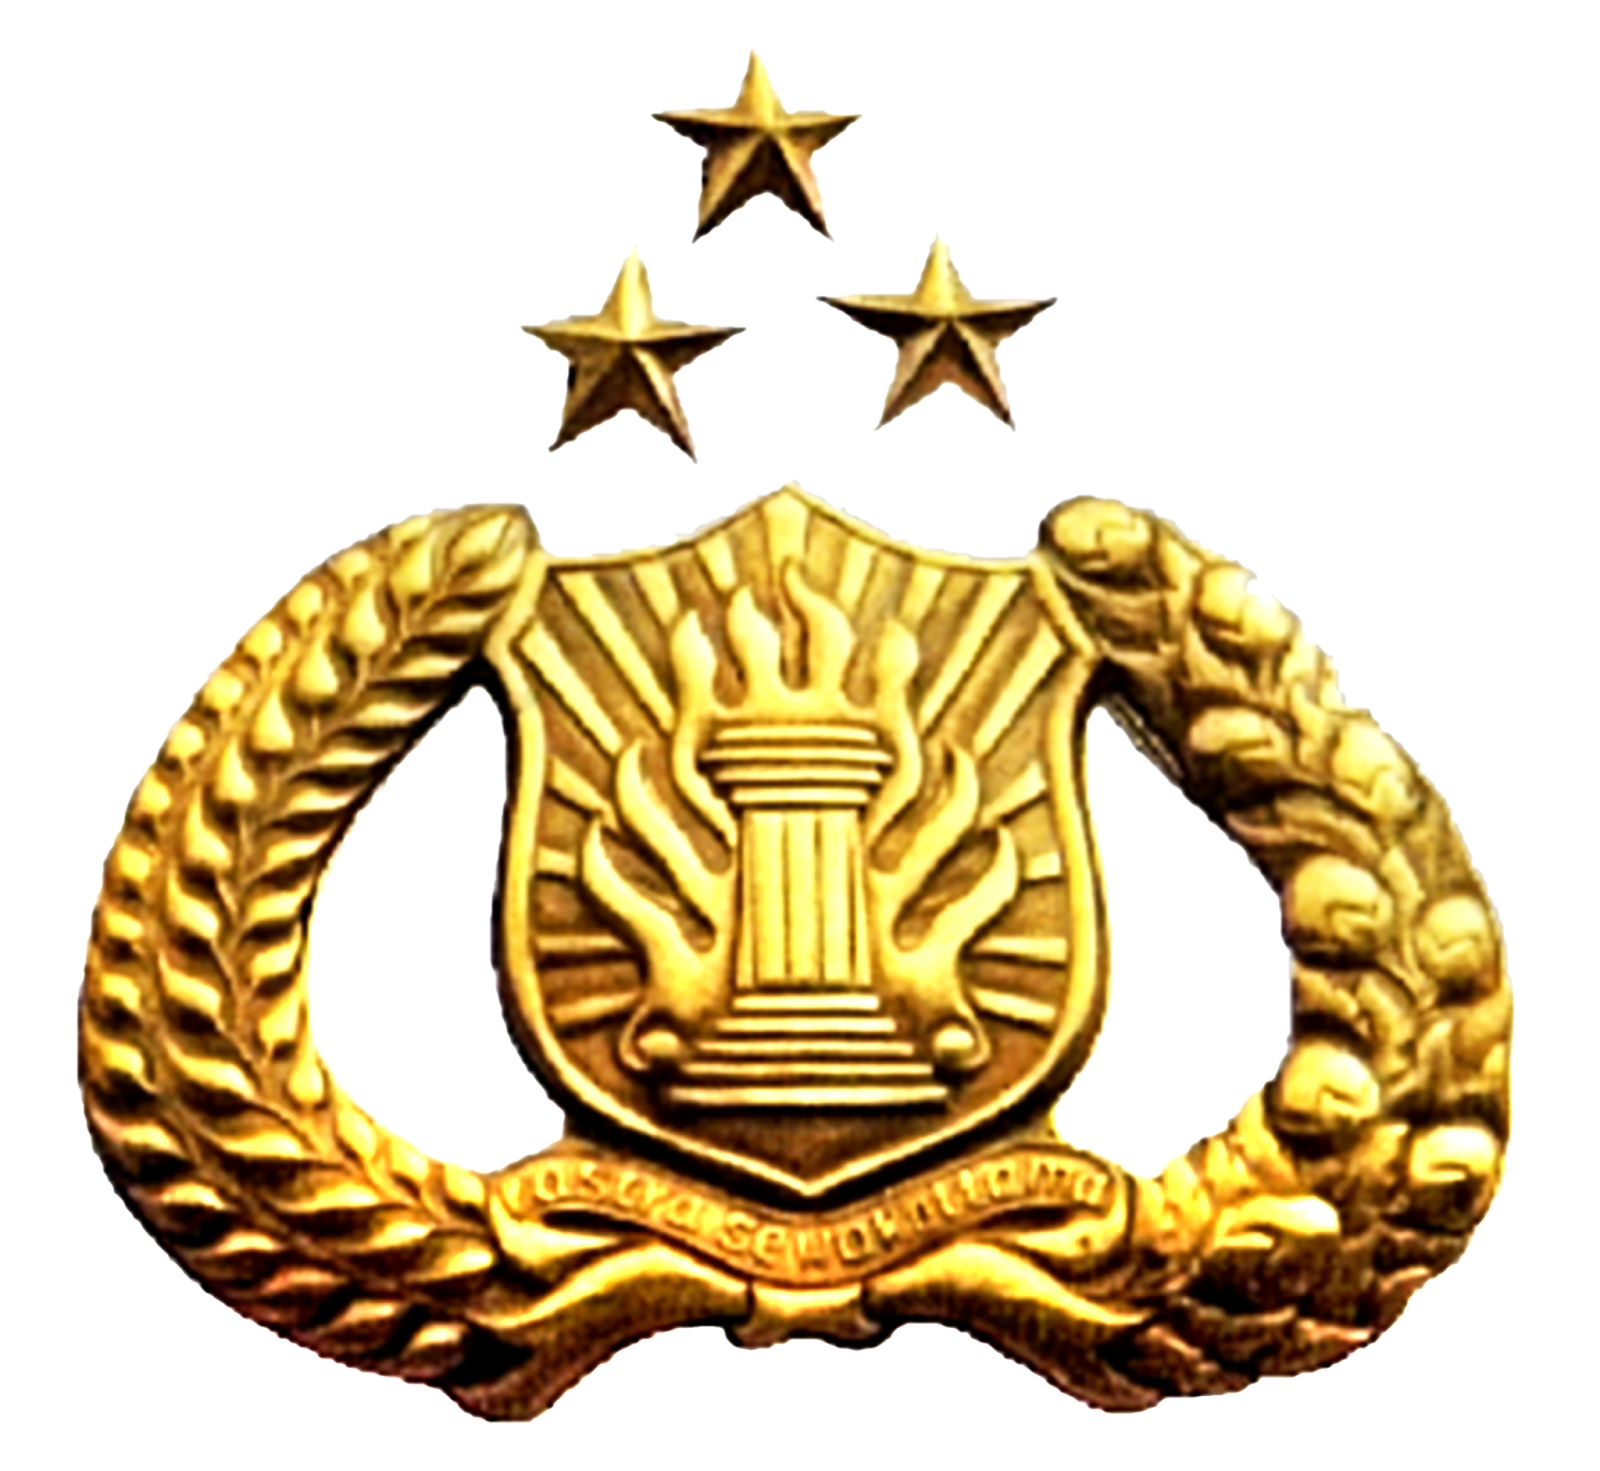 arti lambang direktori online polres seindonesia